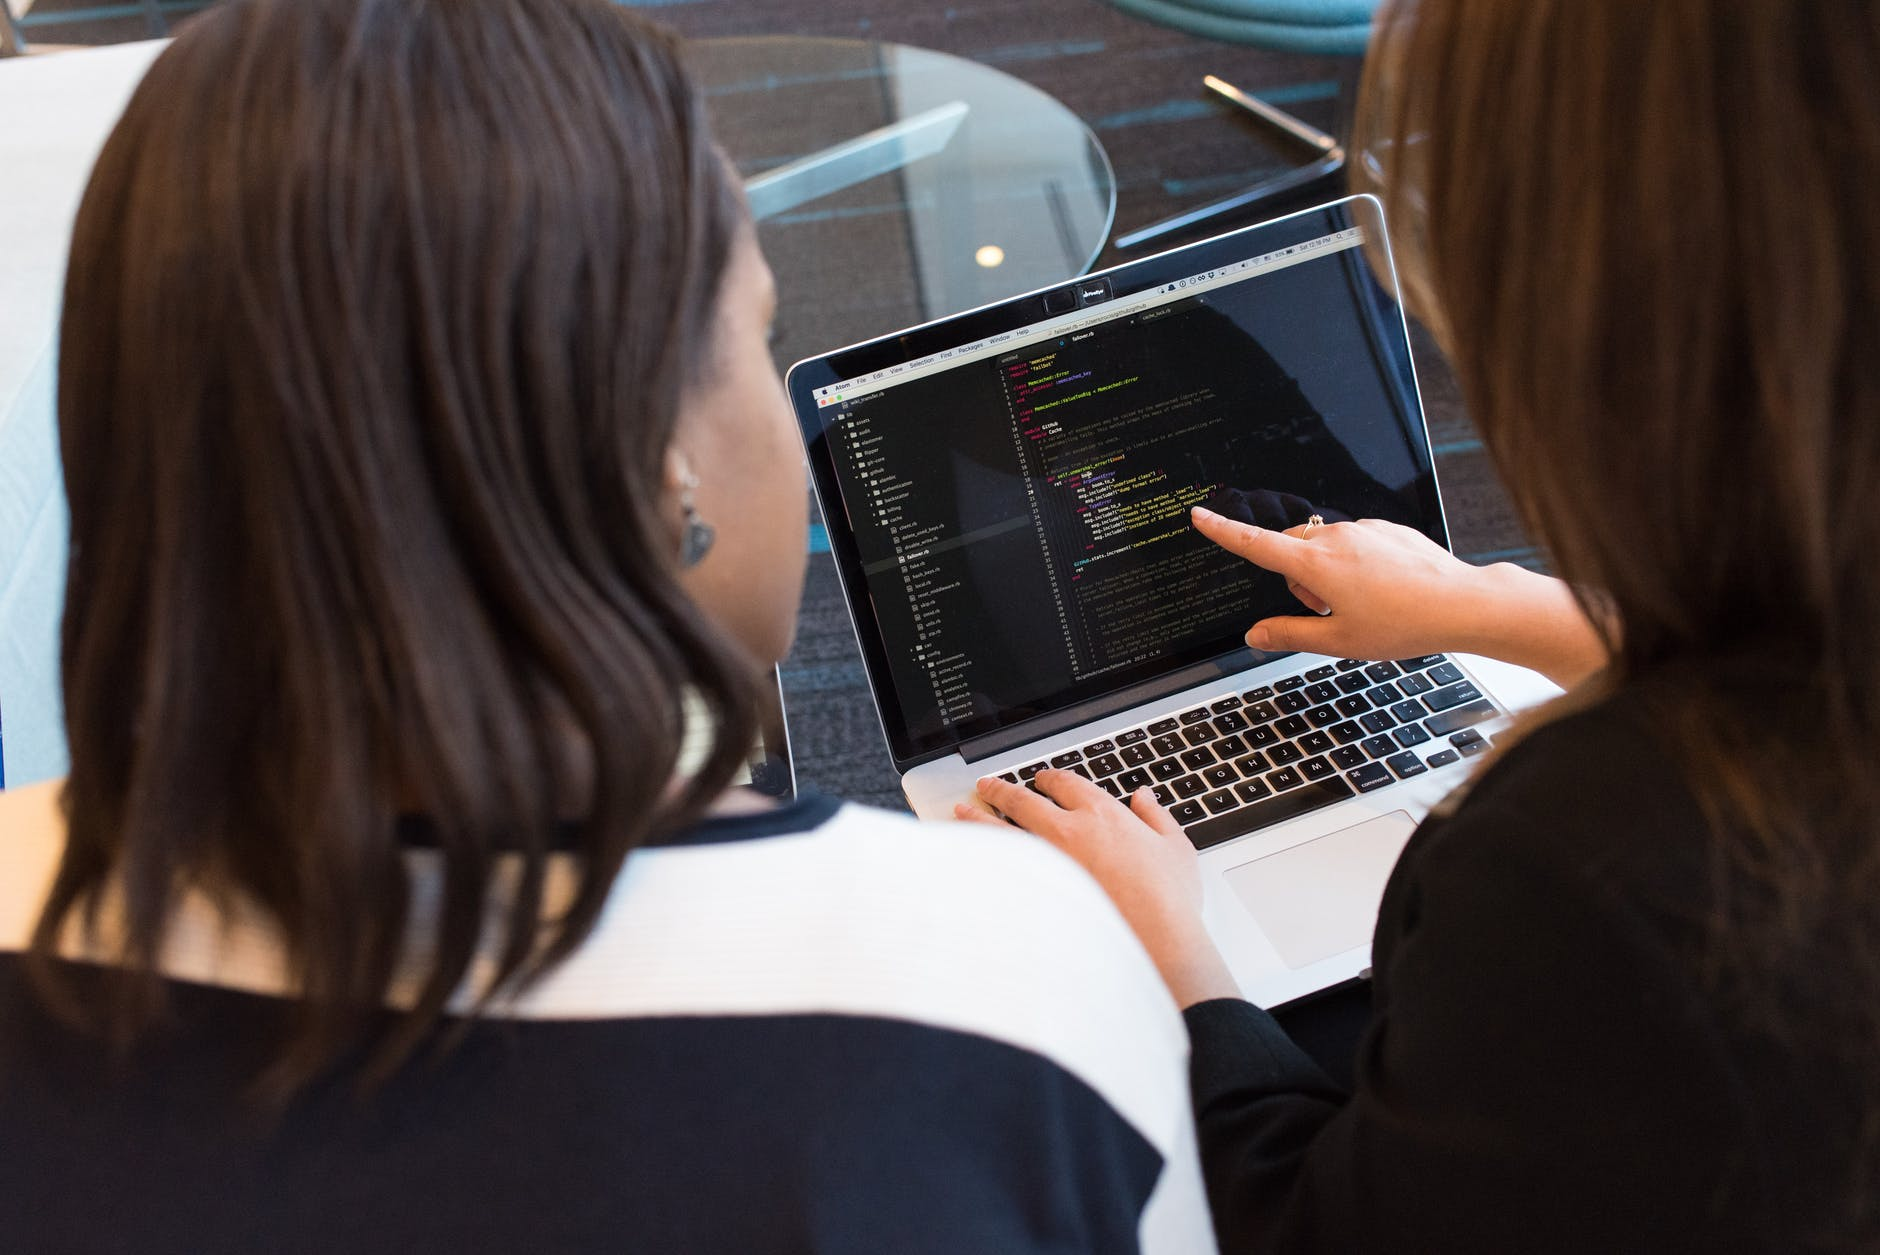 4 Best Screen Monitoring Software